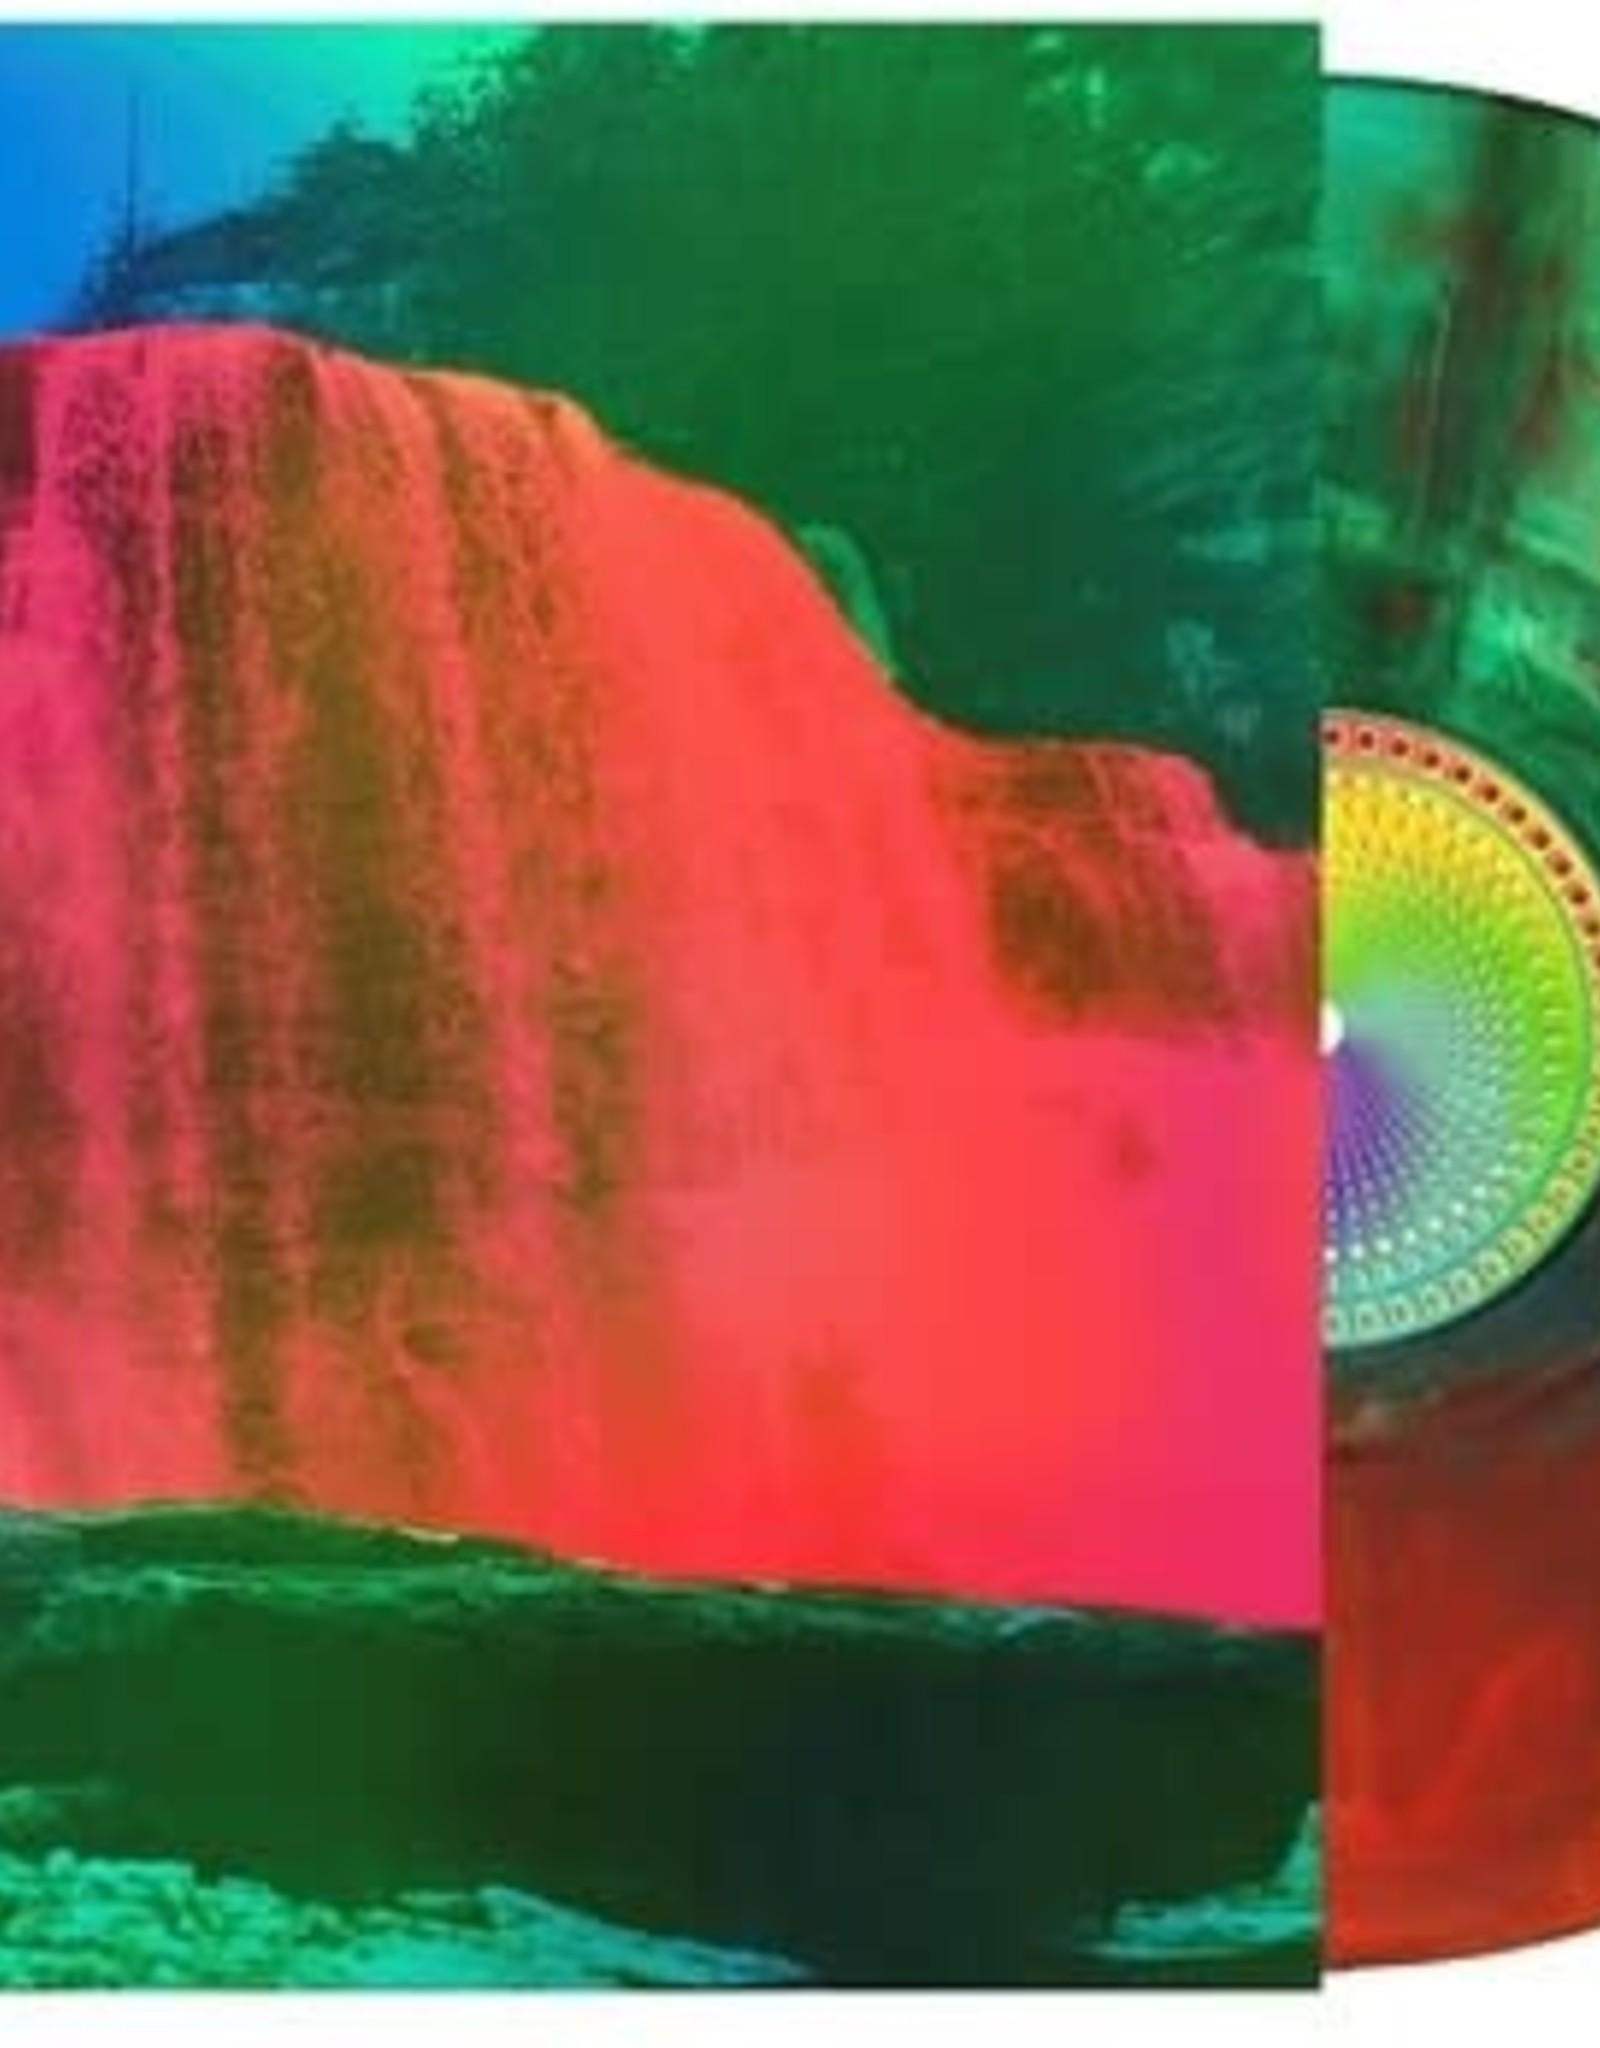 My Morning Jacket - The Waterfall II (Deluxe Edition, 180 Gram Vinyl, Colored Vinyl, Orange, Green)